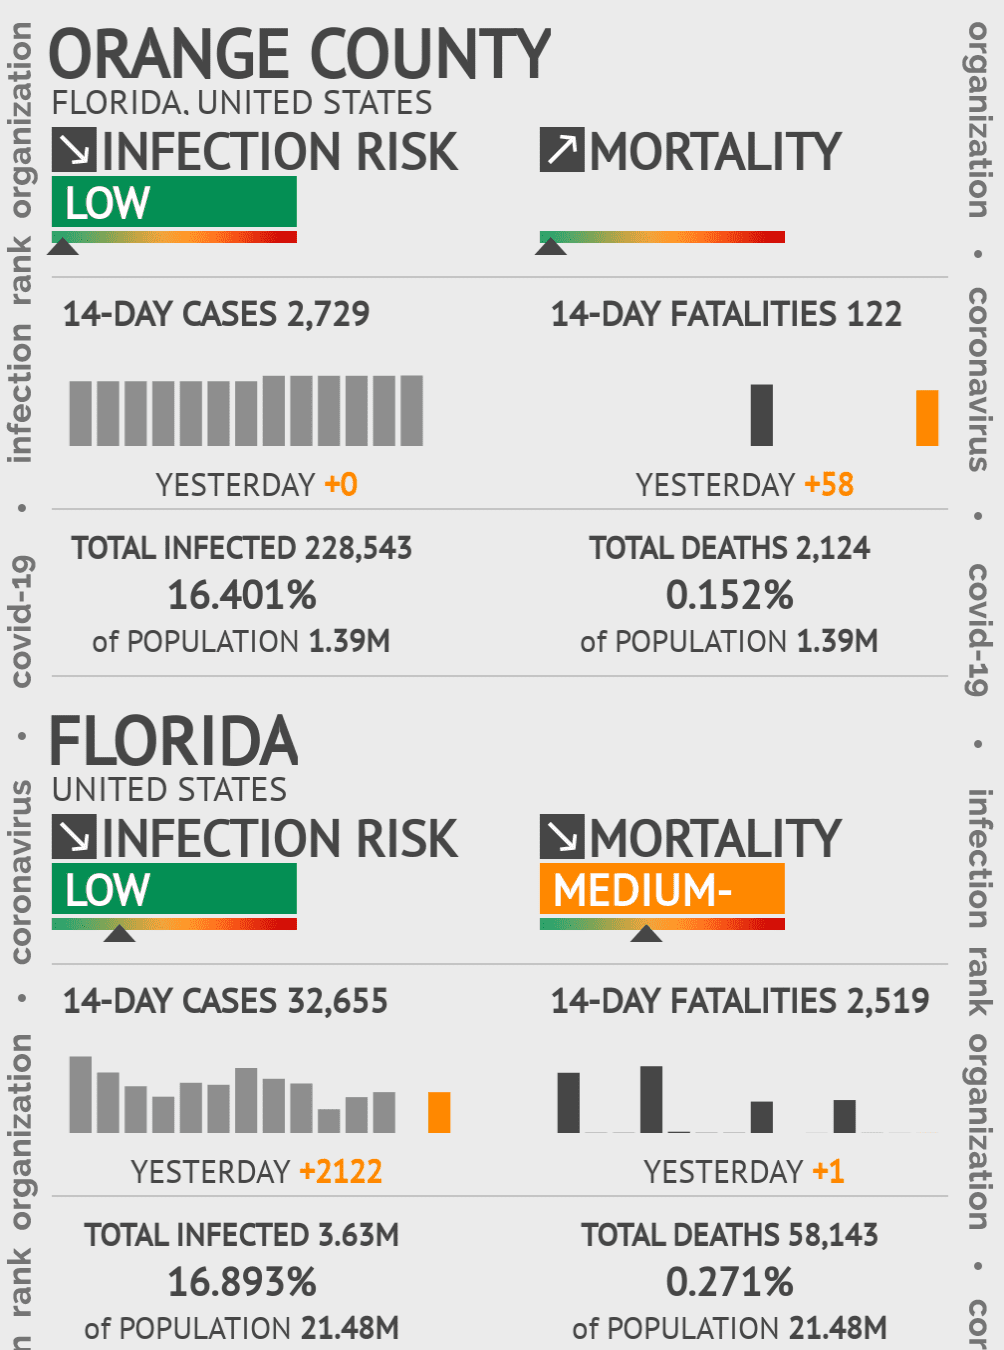 Orange County Coronavirus Covid-19 Risk of Infection on February 26, 2021